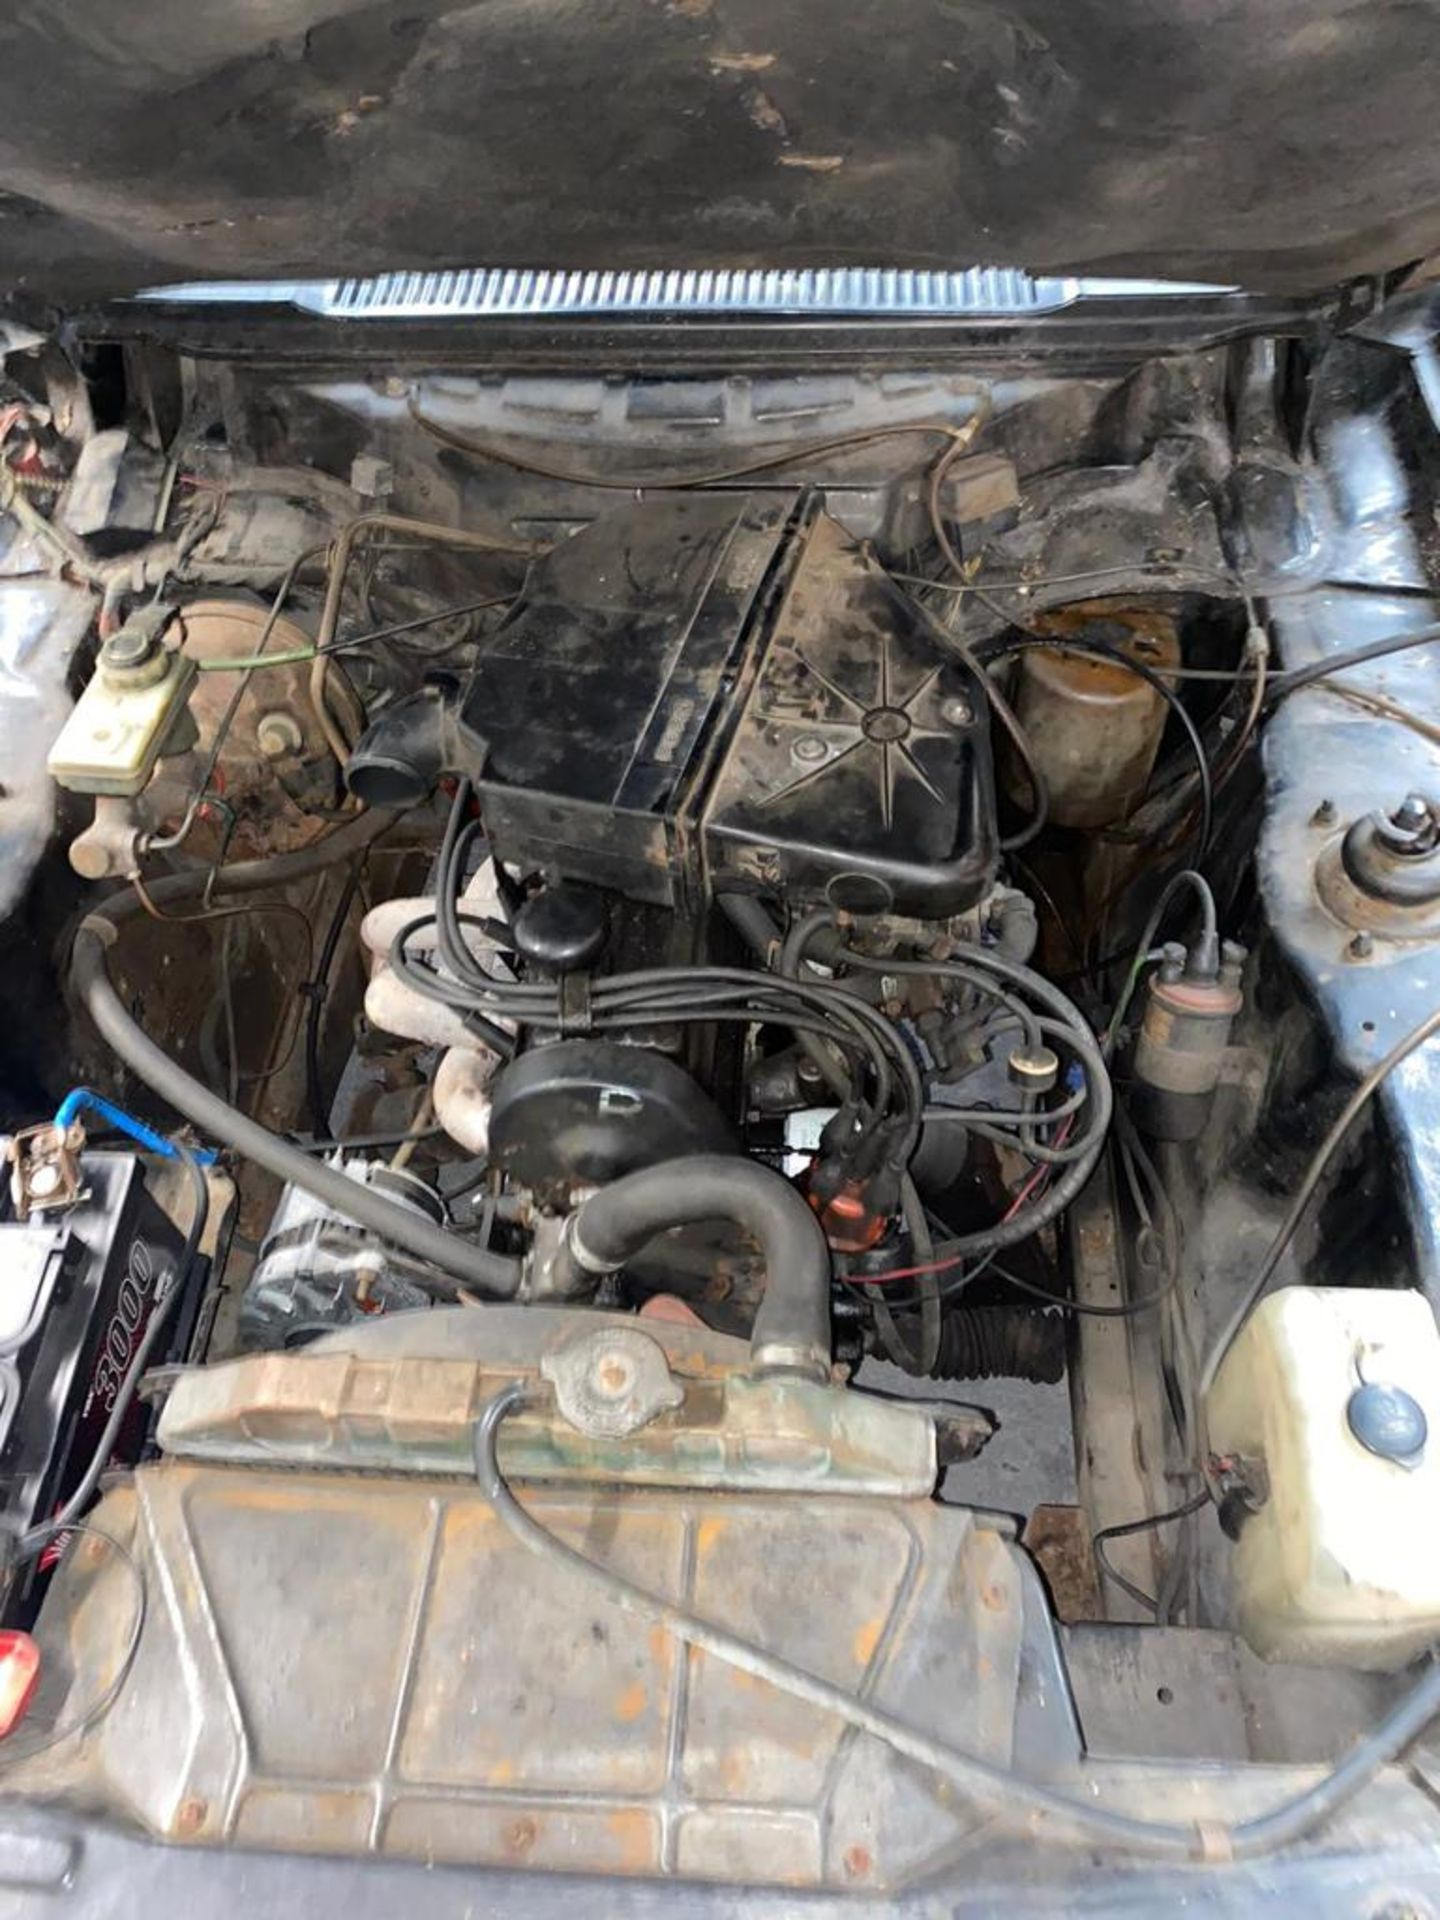 1986/C REG FORD CAPRI LASER AUTO 2.0 PETROL BLACK 3 DOOR *NO VAT* - Image 25 of 32